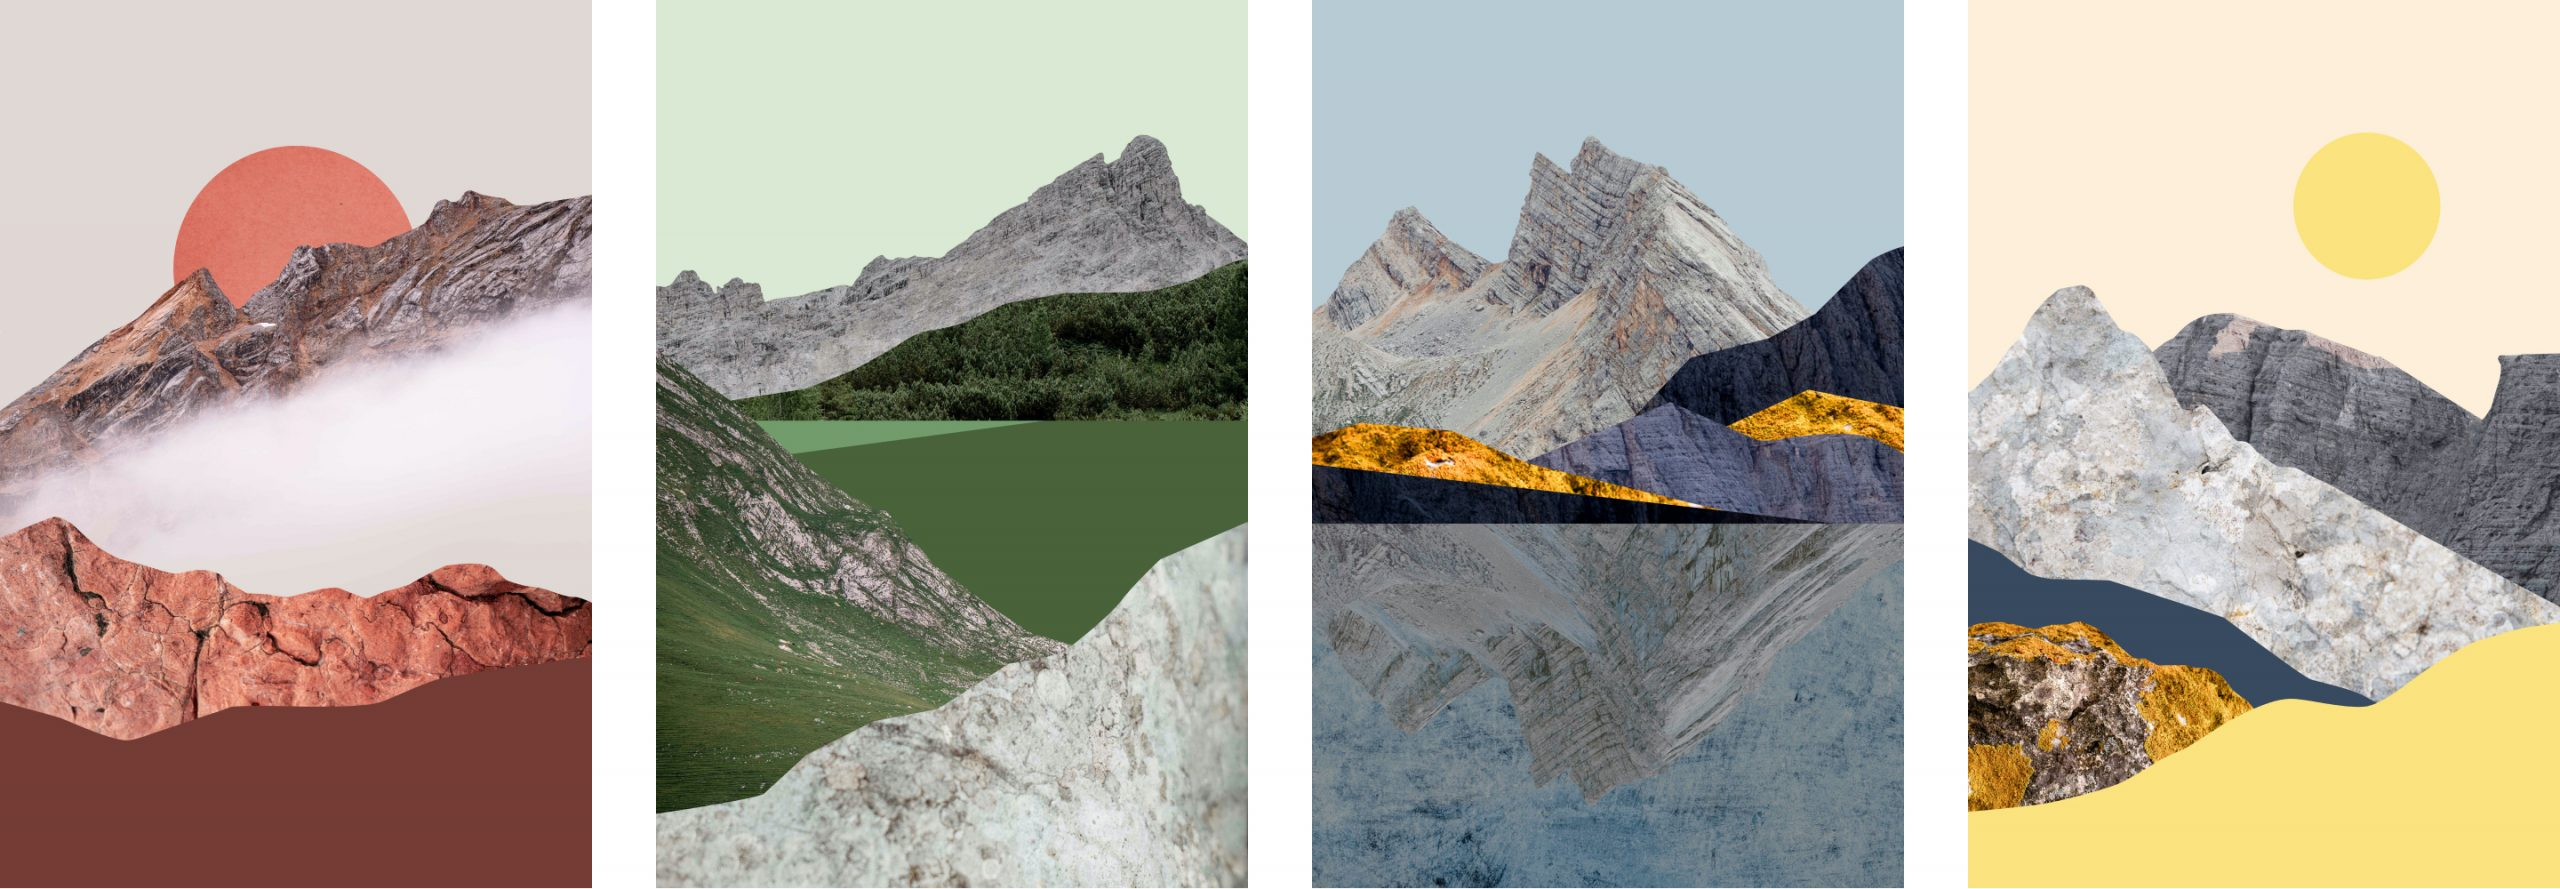 pascher-heinz-lamunt-launch-illustrations